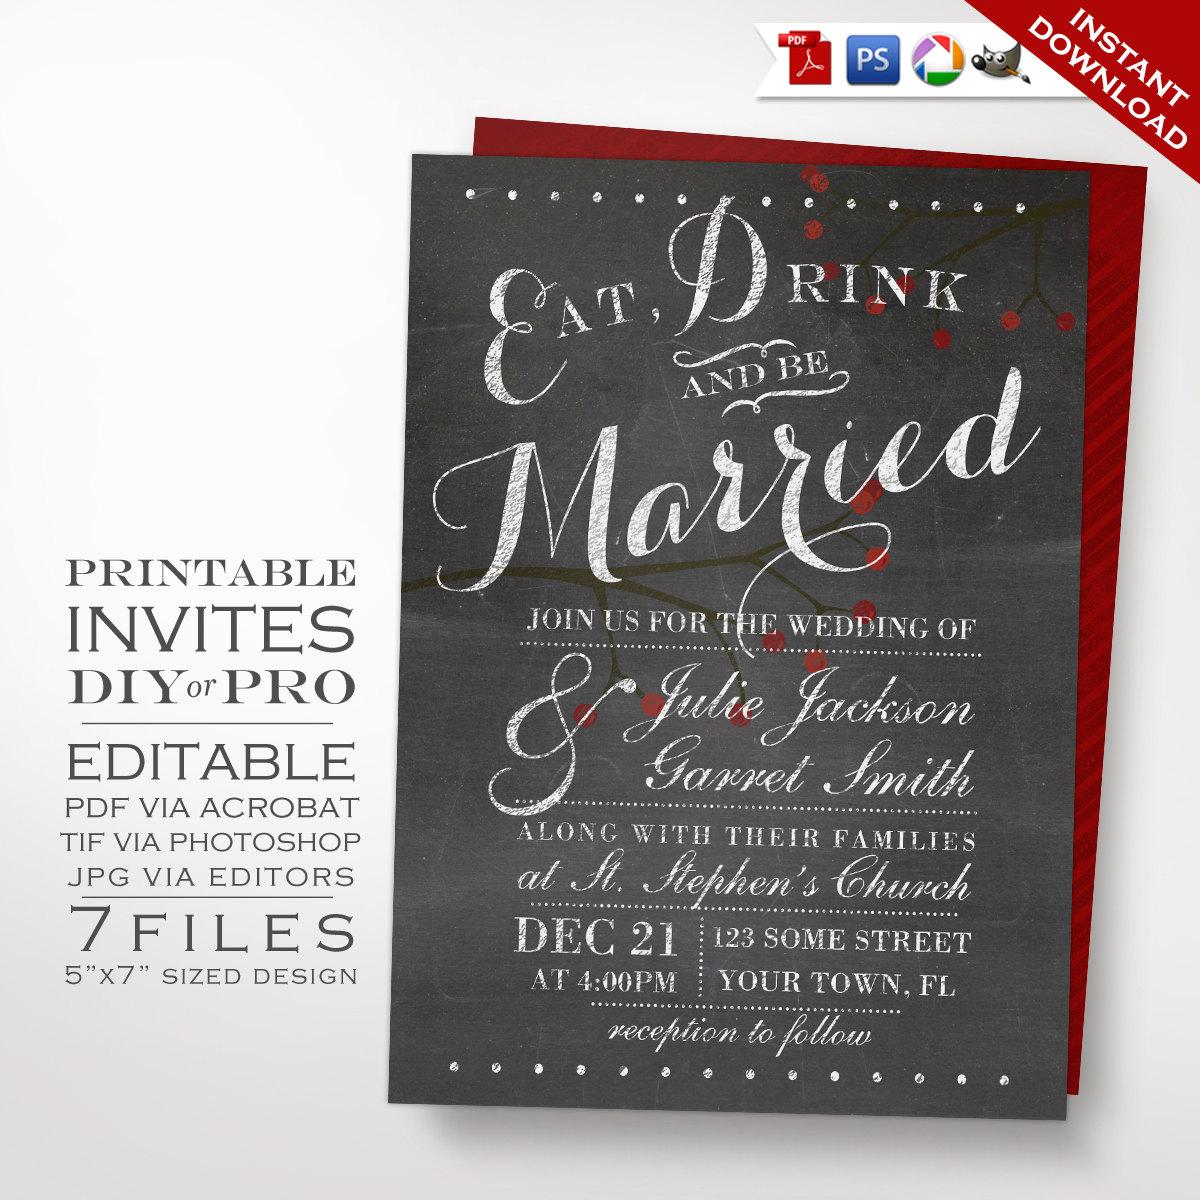 Chalkboard Wedding Invitation Template: Printable DIY Berries Chalkboard Wedding Invitation